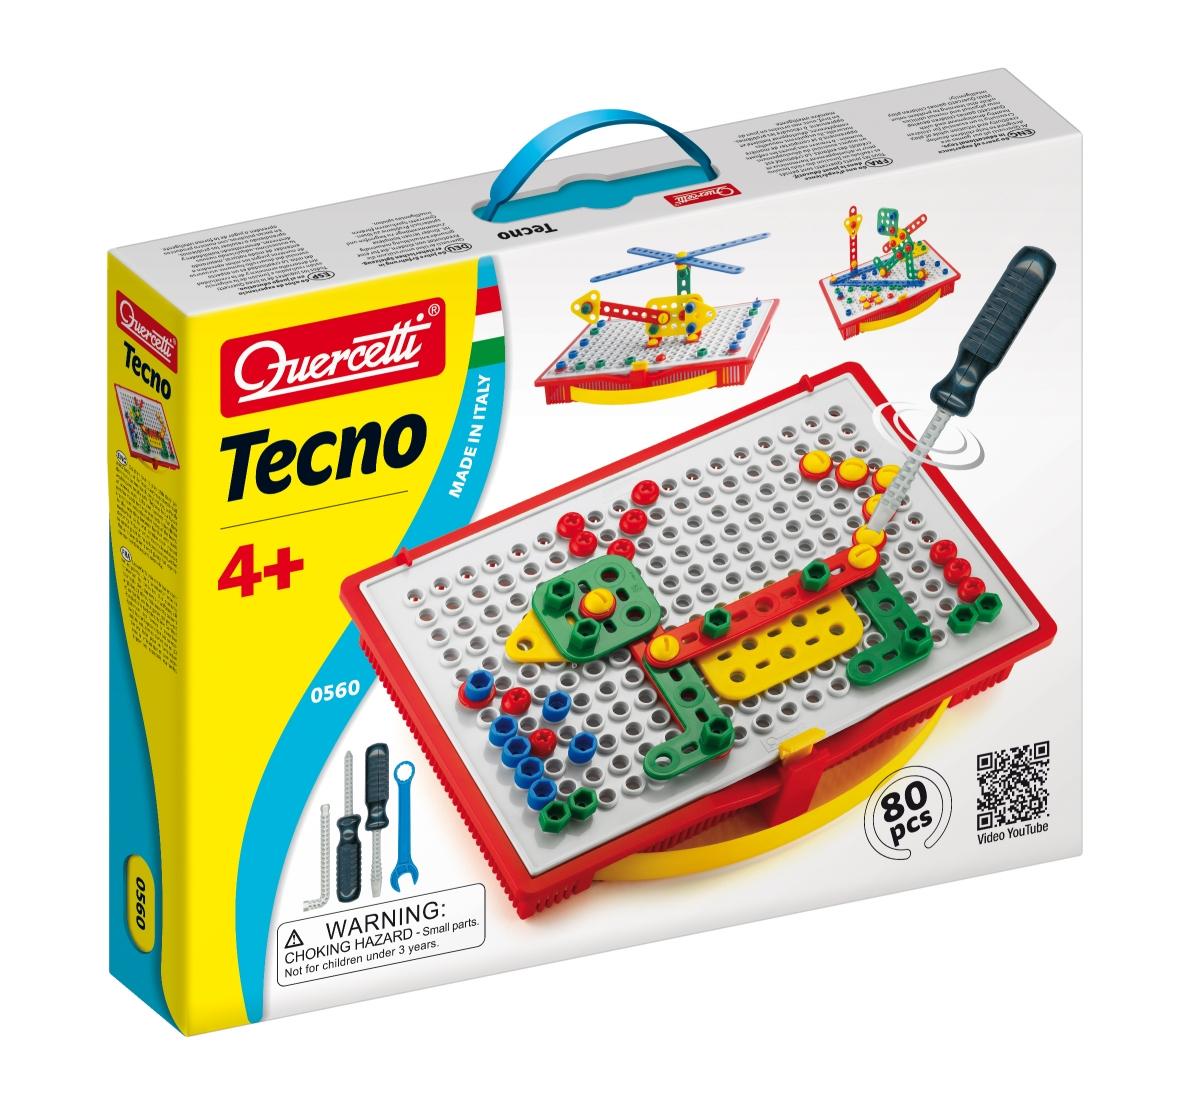 Quercetti Tecno 80 ks v kufříku 0560